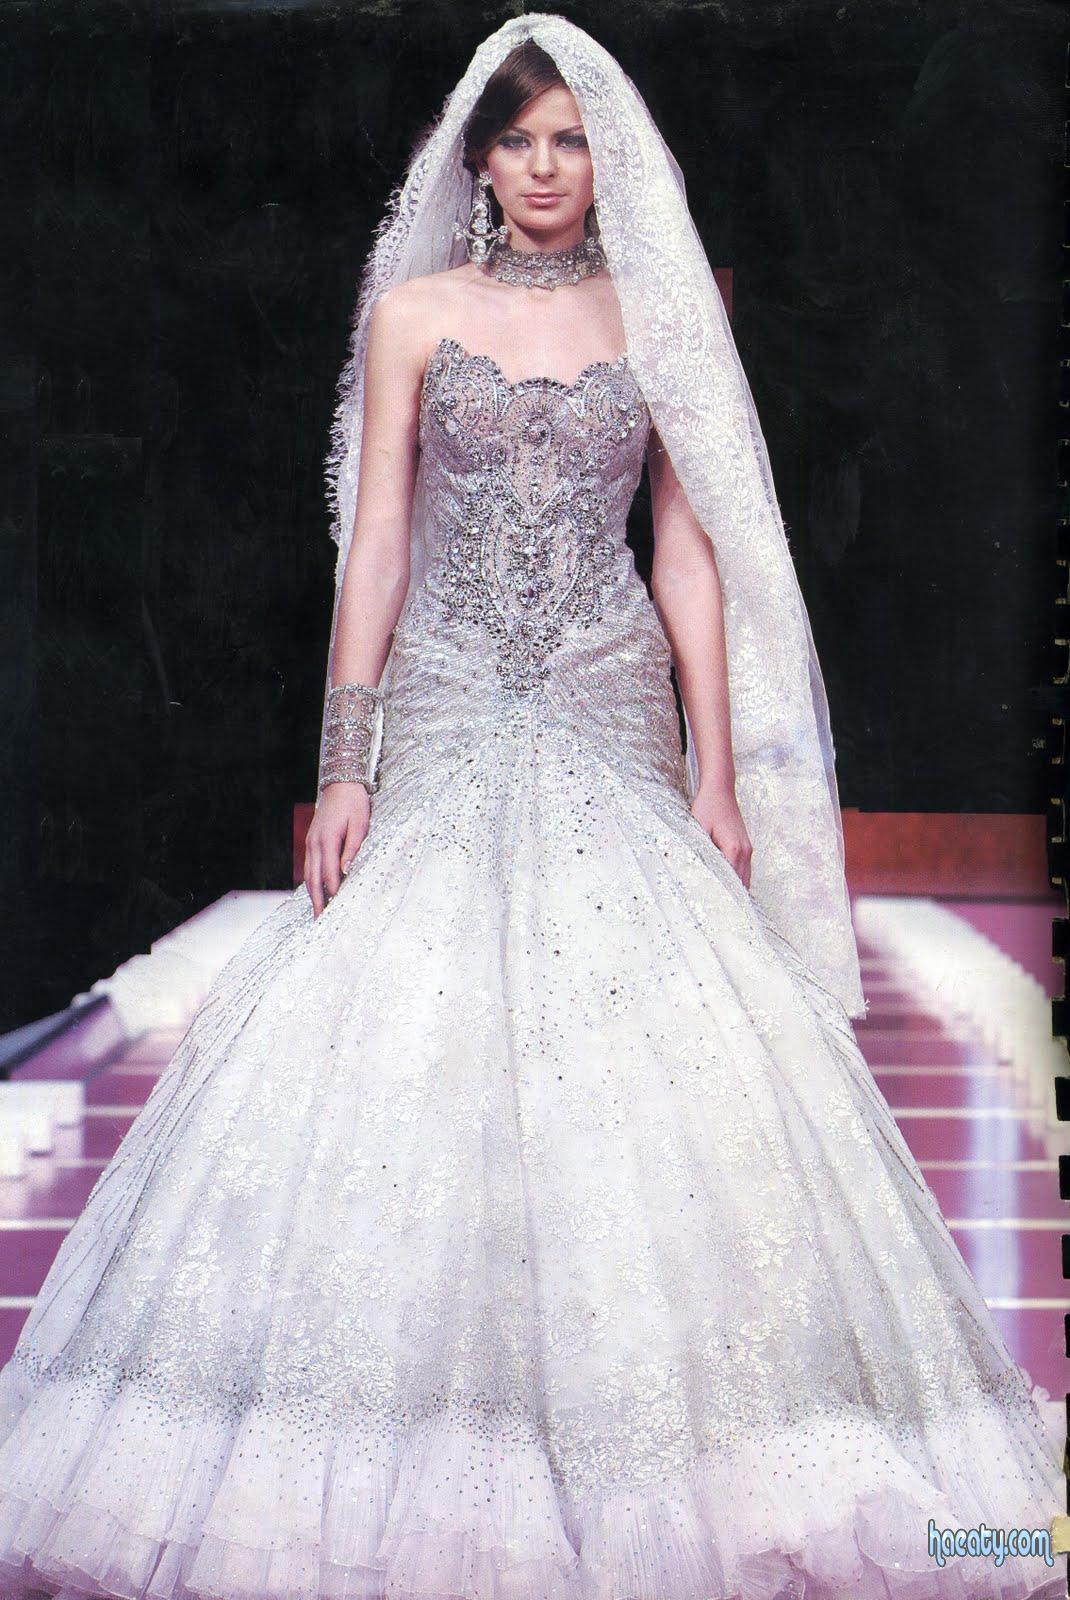 2014 2014 Wedding Dresses 137753630911.jpg